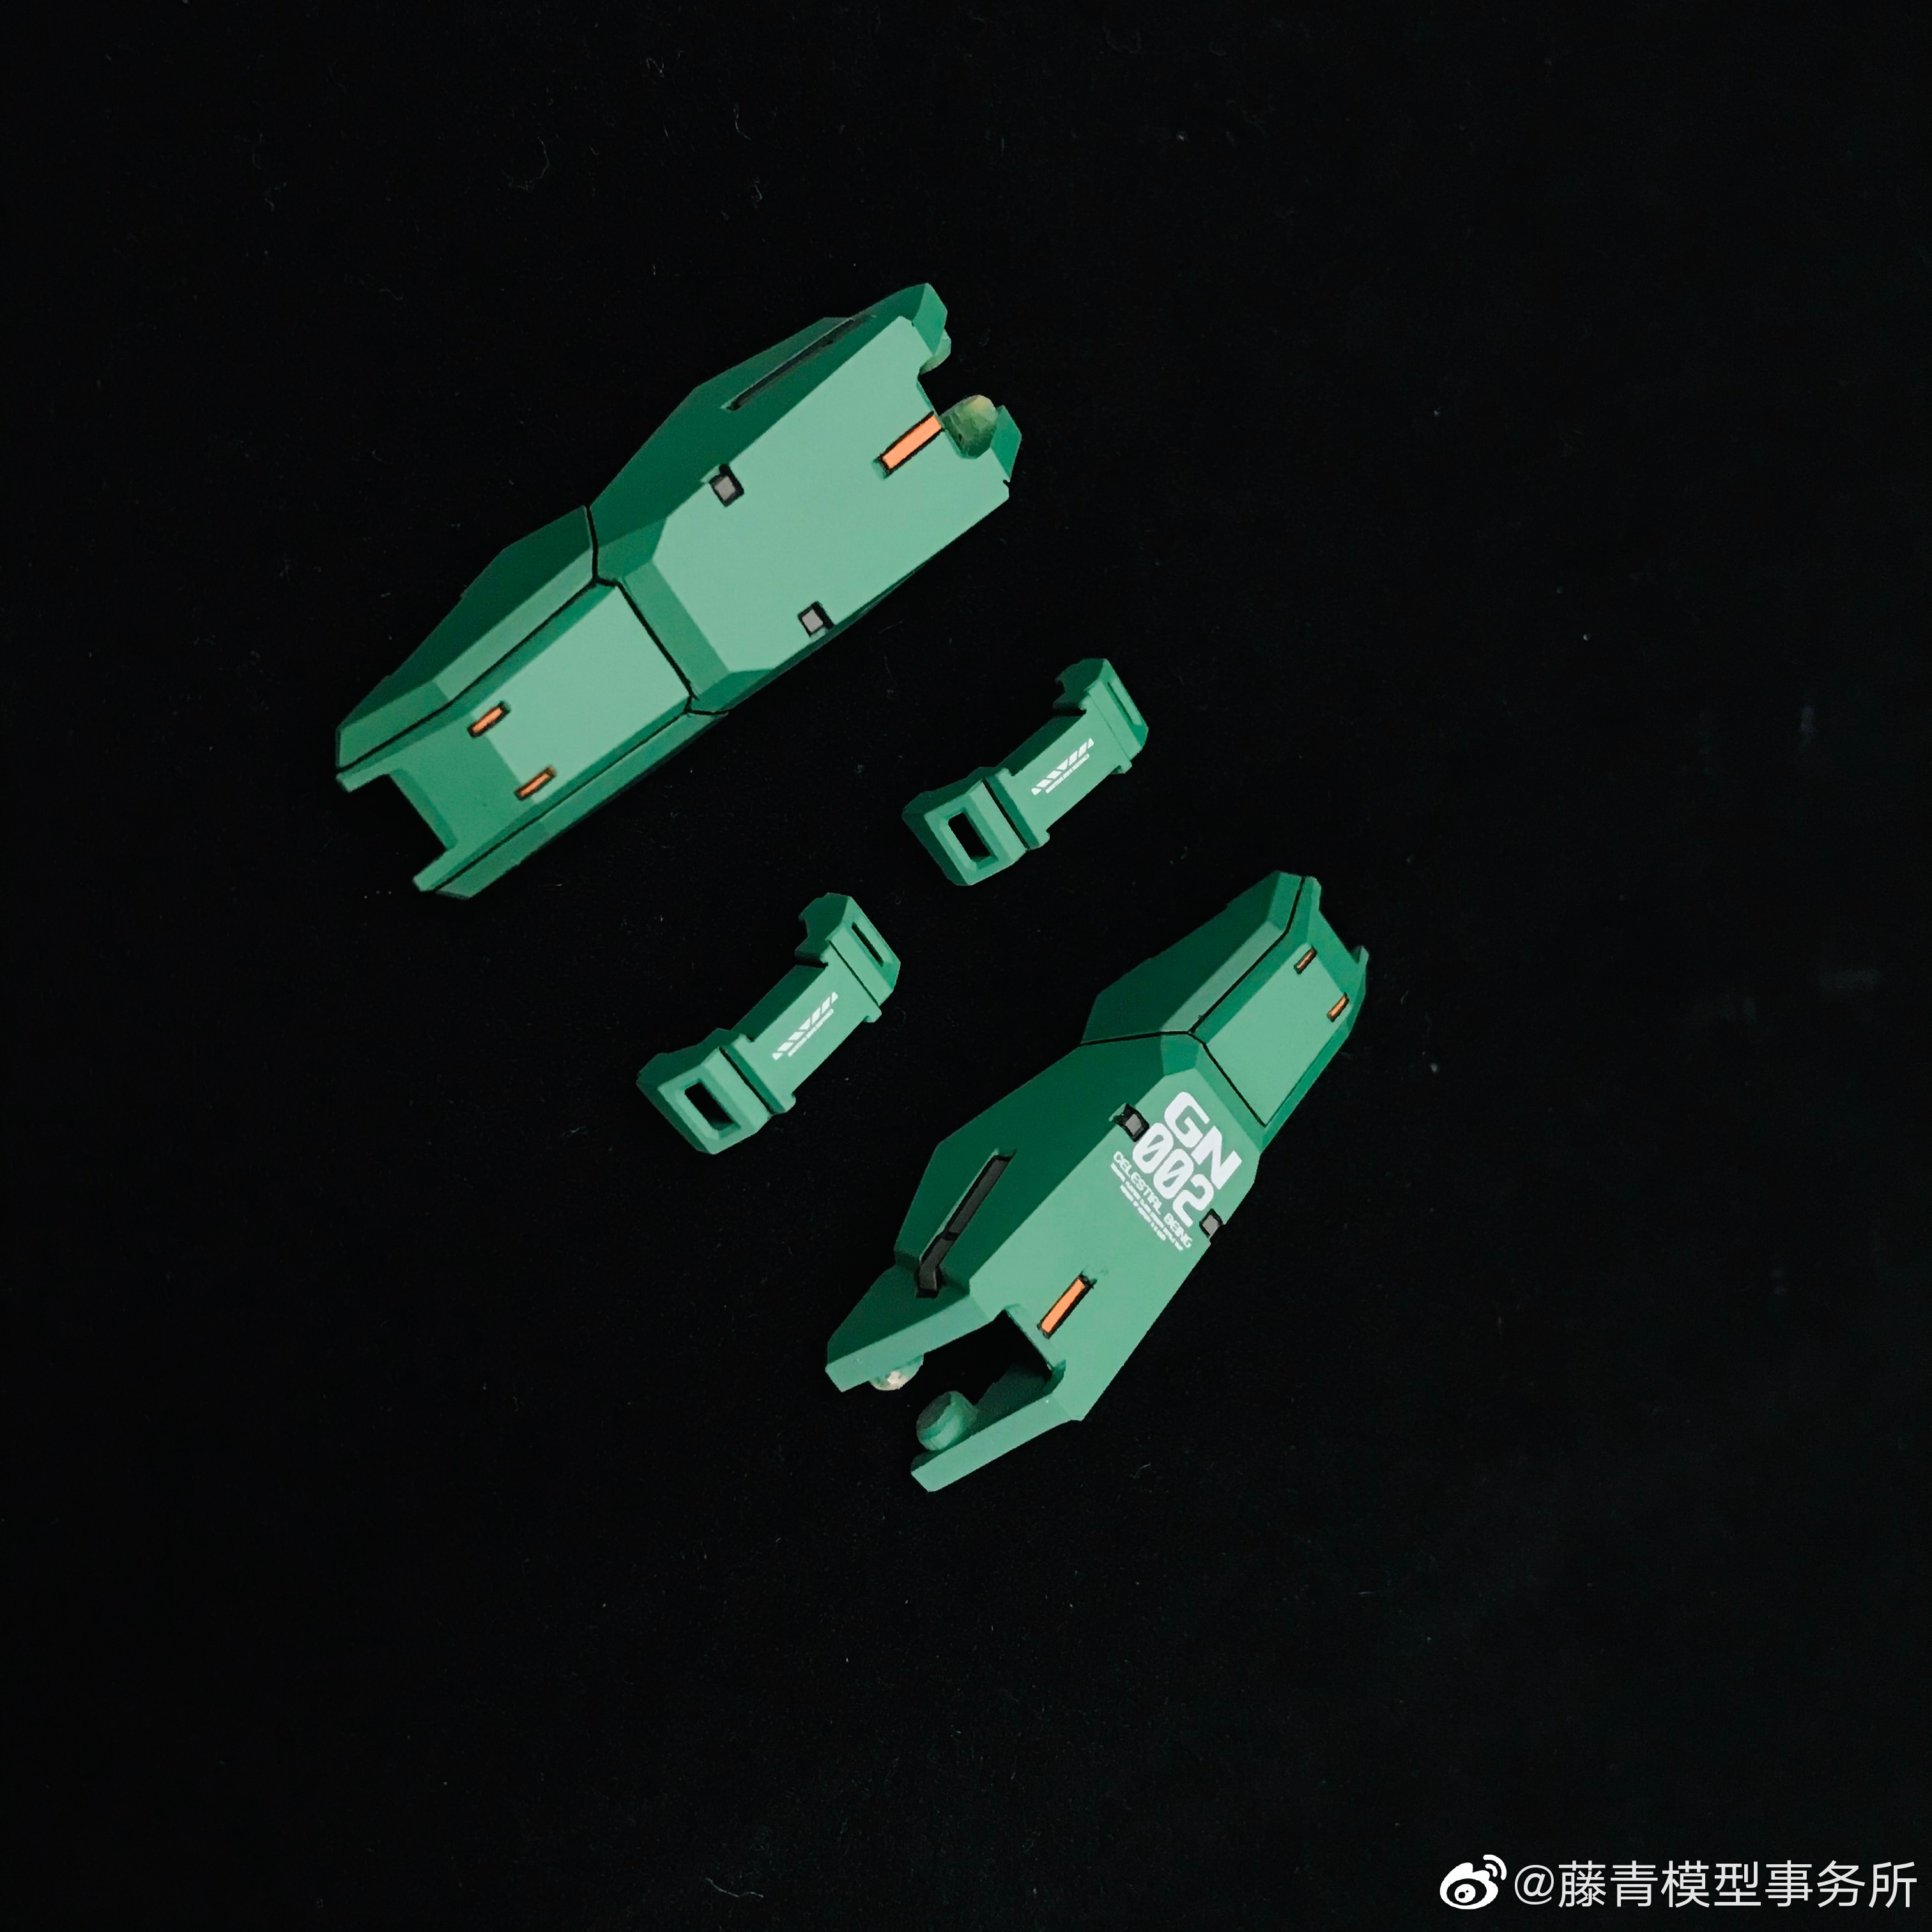 G507_Fortune_Meows_Studio_GN002_Gundam_Dynames_MG_024.jpg